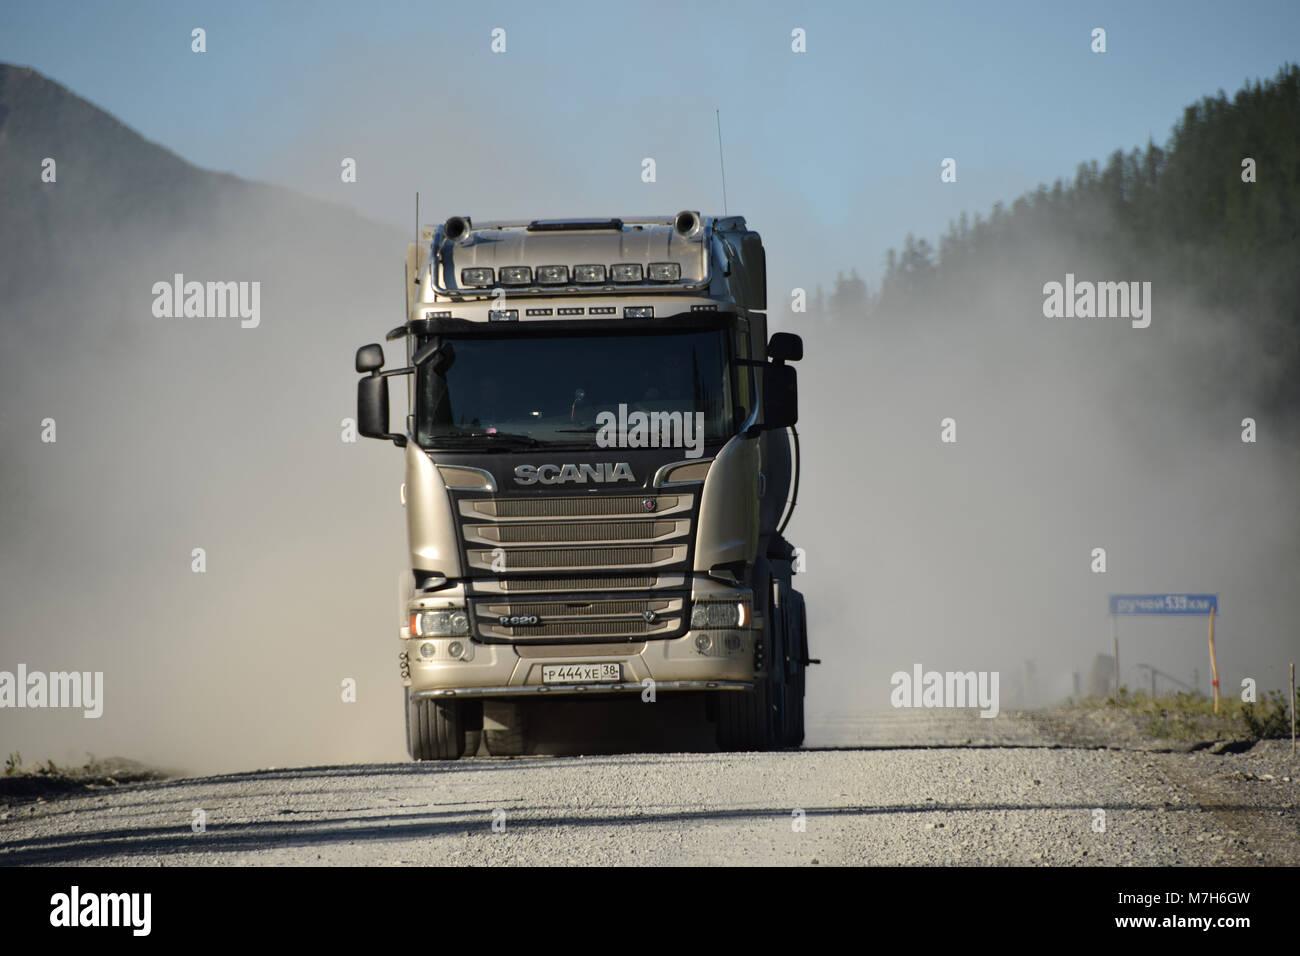 Scania Truck Road Stock Photos & Scania Truck Road Stock